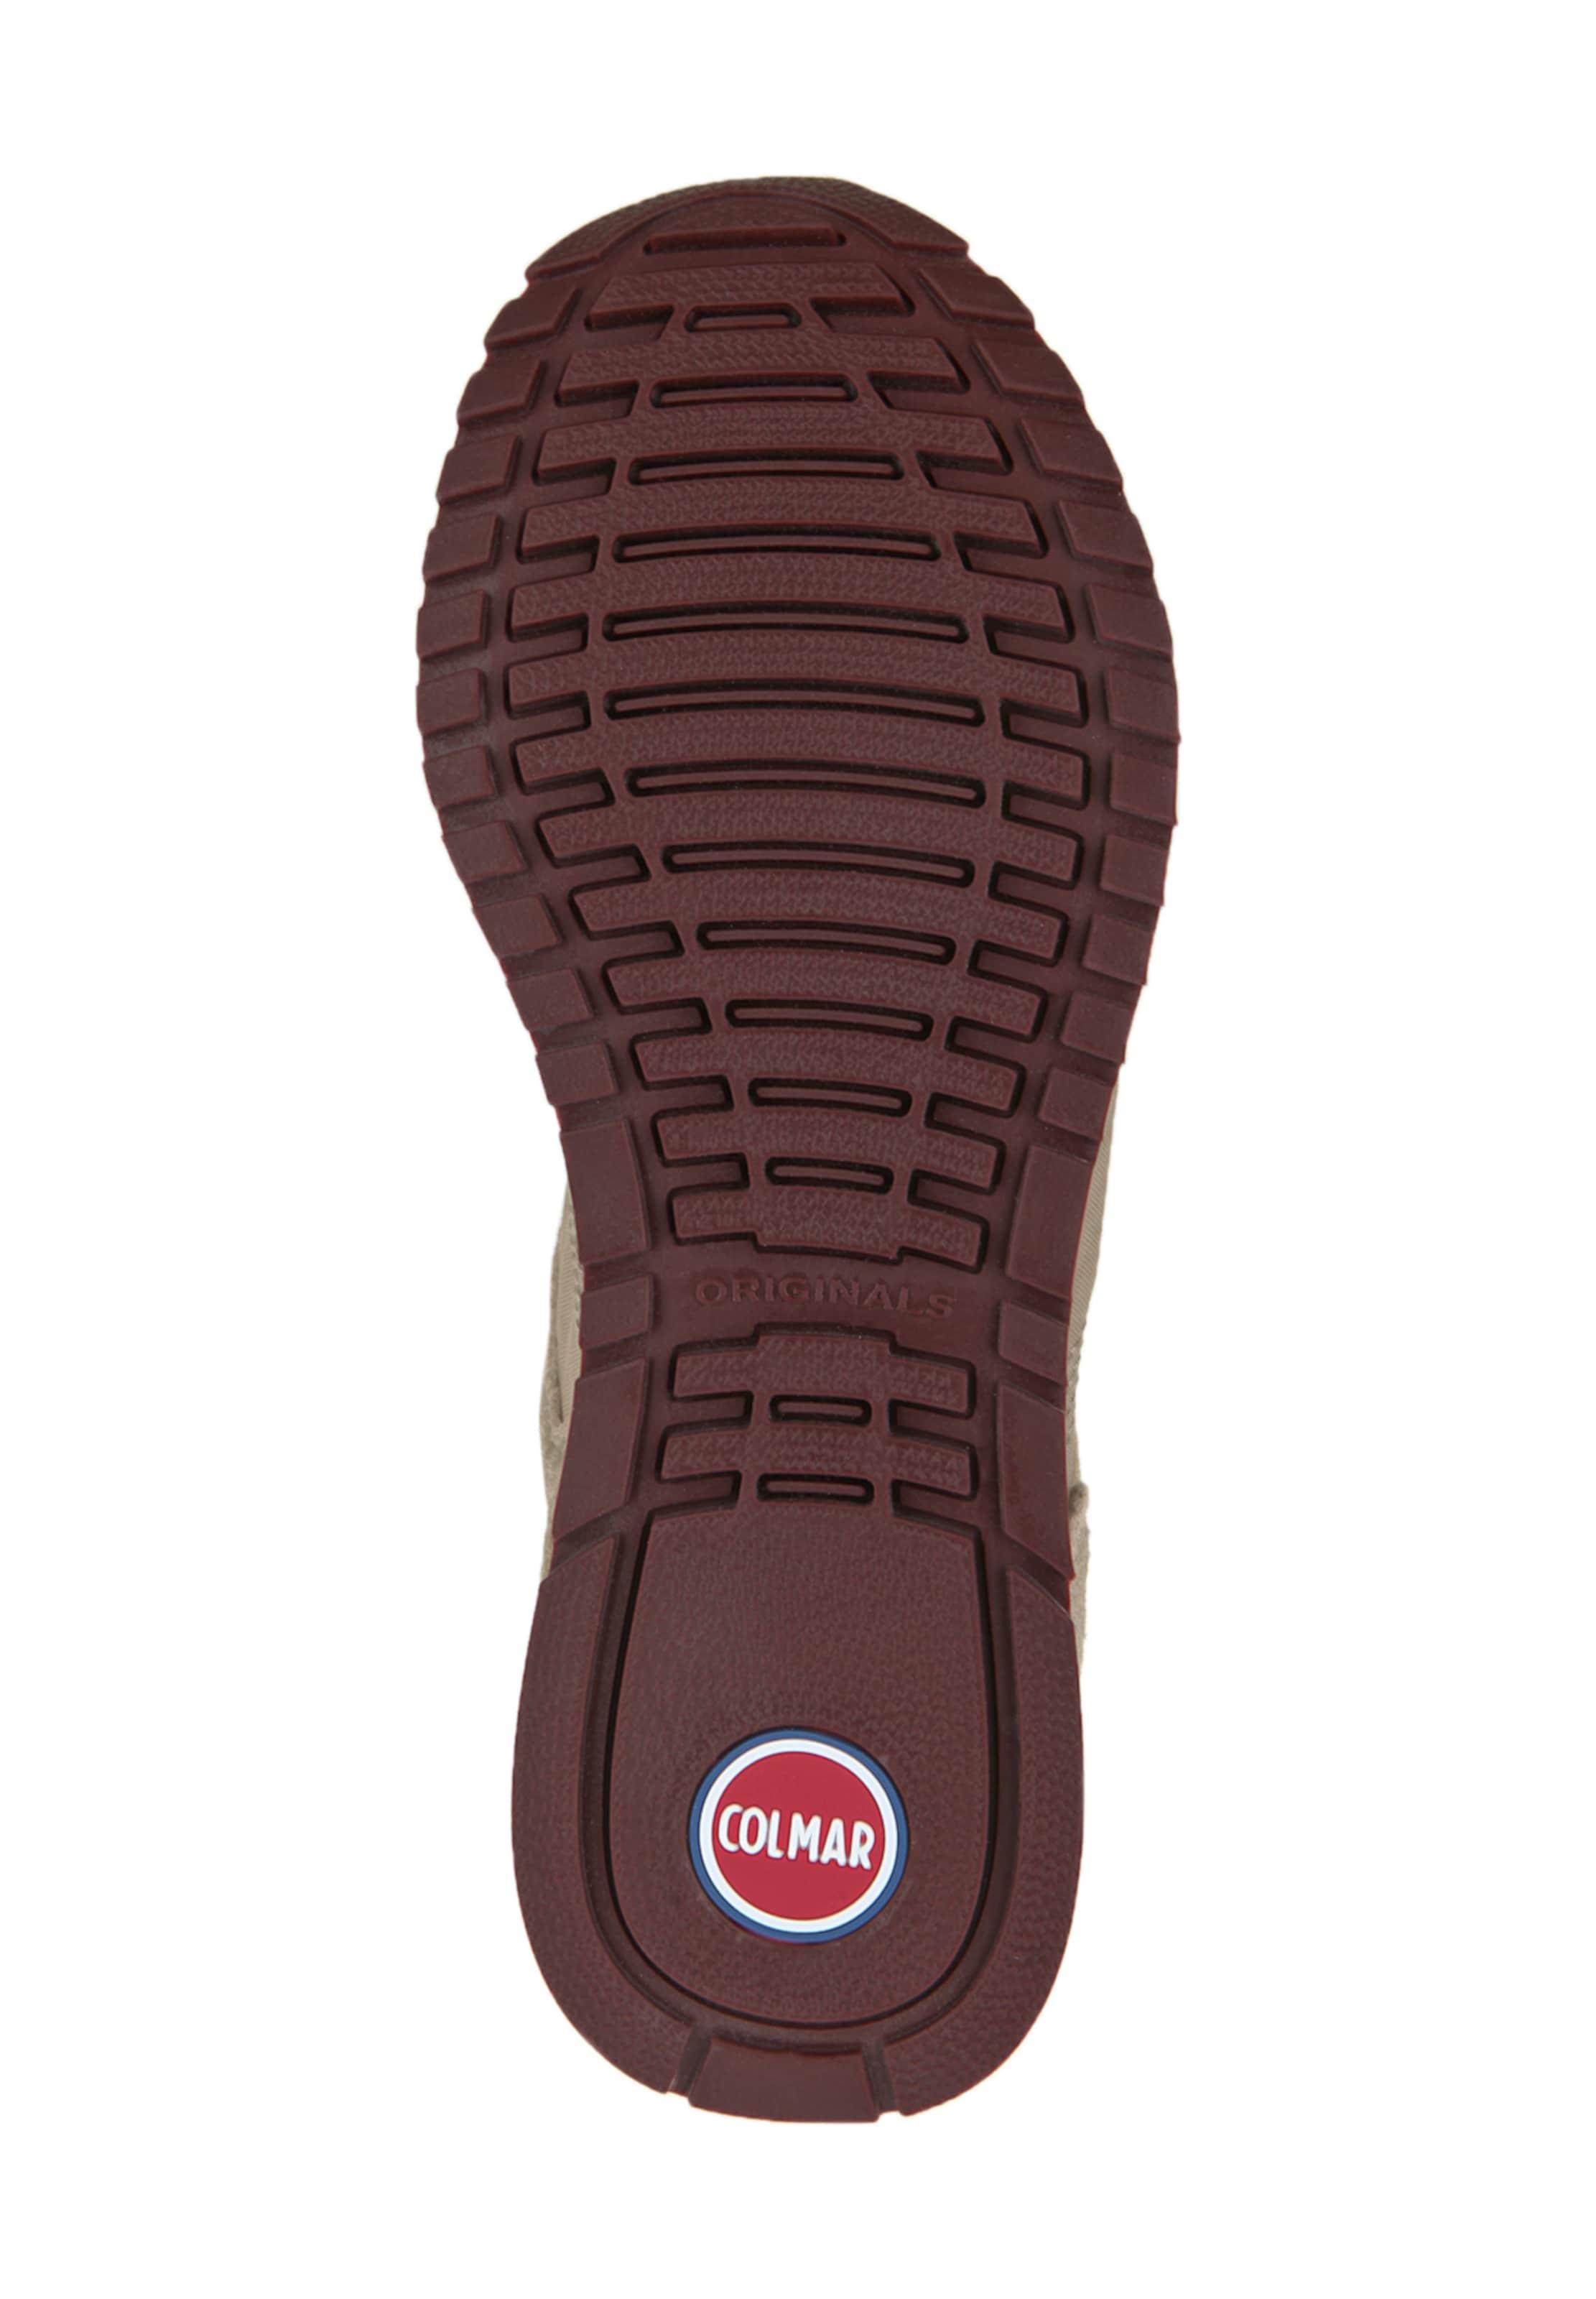 Outlet Factory Outlet Colmar Sneaker TRAVIS COLORS WOMEN Sexy Sport Mode-Stil Zu Verkaufen Mit Mastercard Günstigem Preis d5ybjIZ0Ti